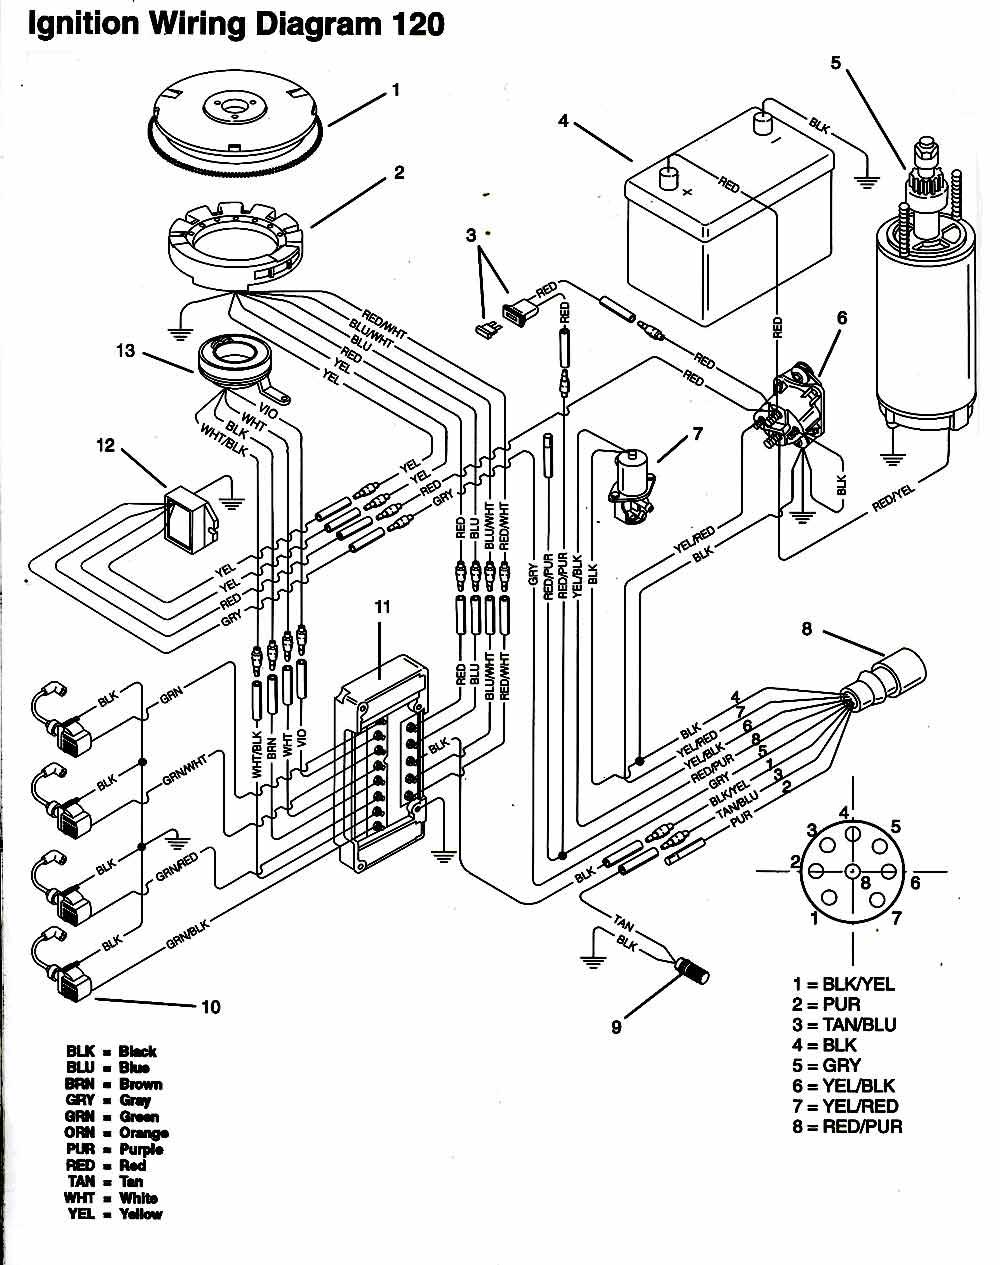 Amazing Auto Gauge Tachometer Wiring Diagram Frieze - Best Images ...